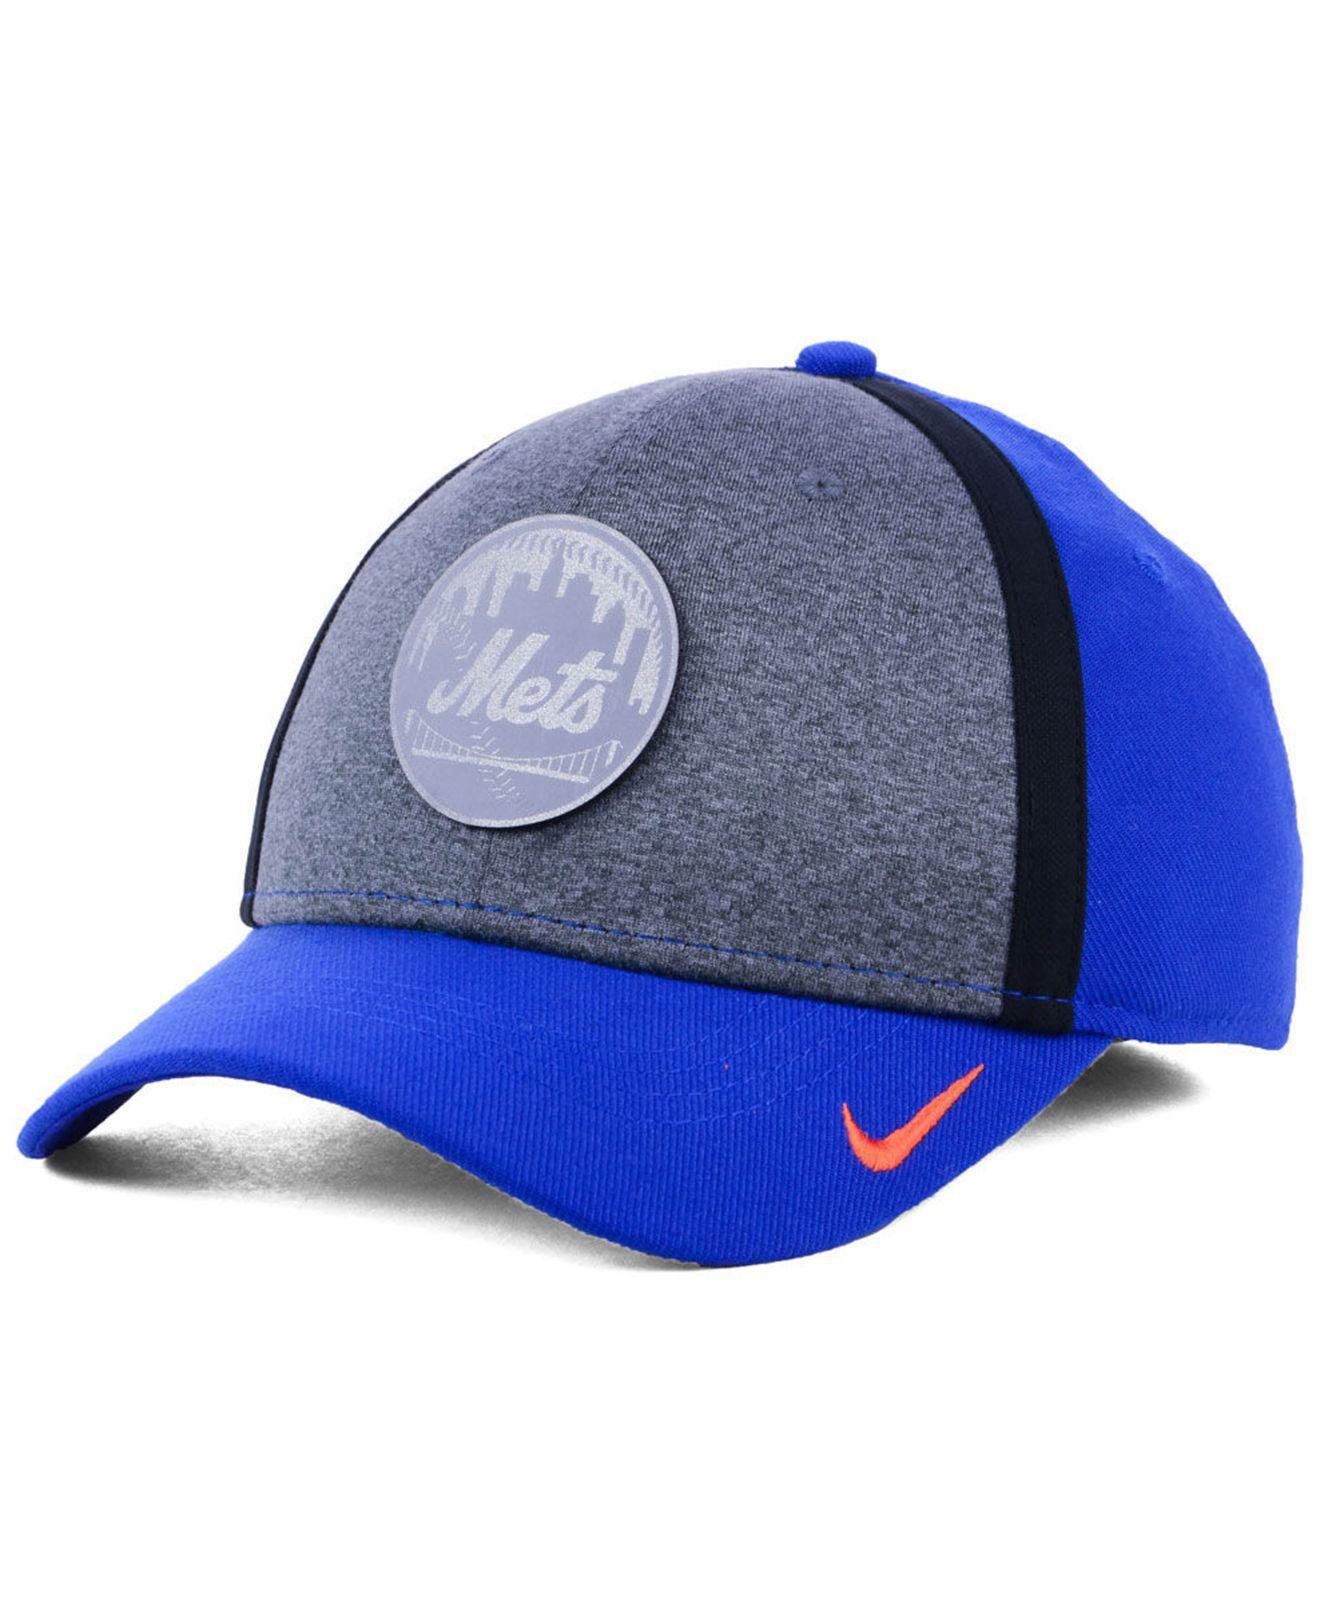 a0555169b0771 Lyst - Nike New York Mets Team Color Reflective Swooshflex Cap in ...